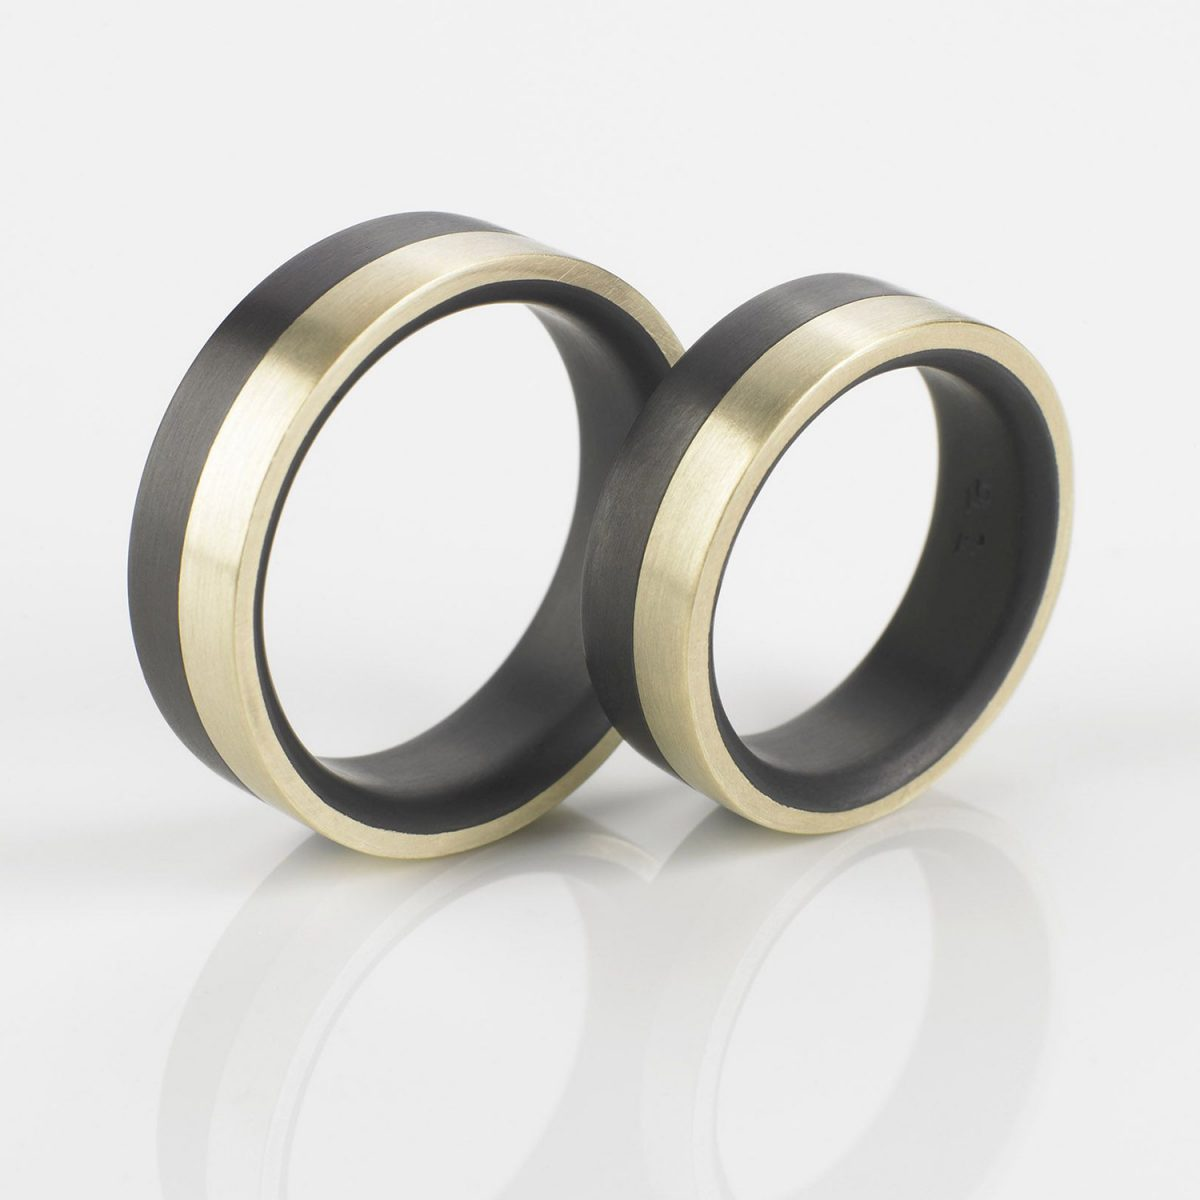 Tantal Ehering | Hochzeitsringe | Ringpaar True Love Collection No:32